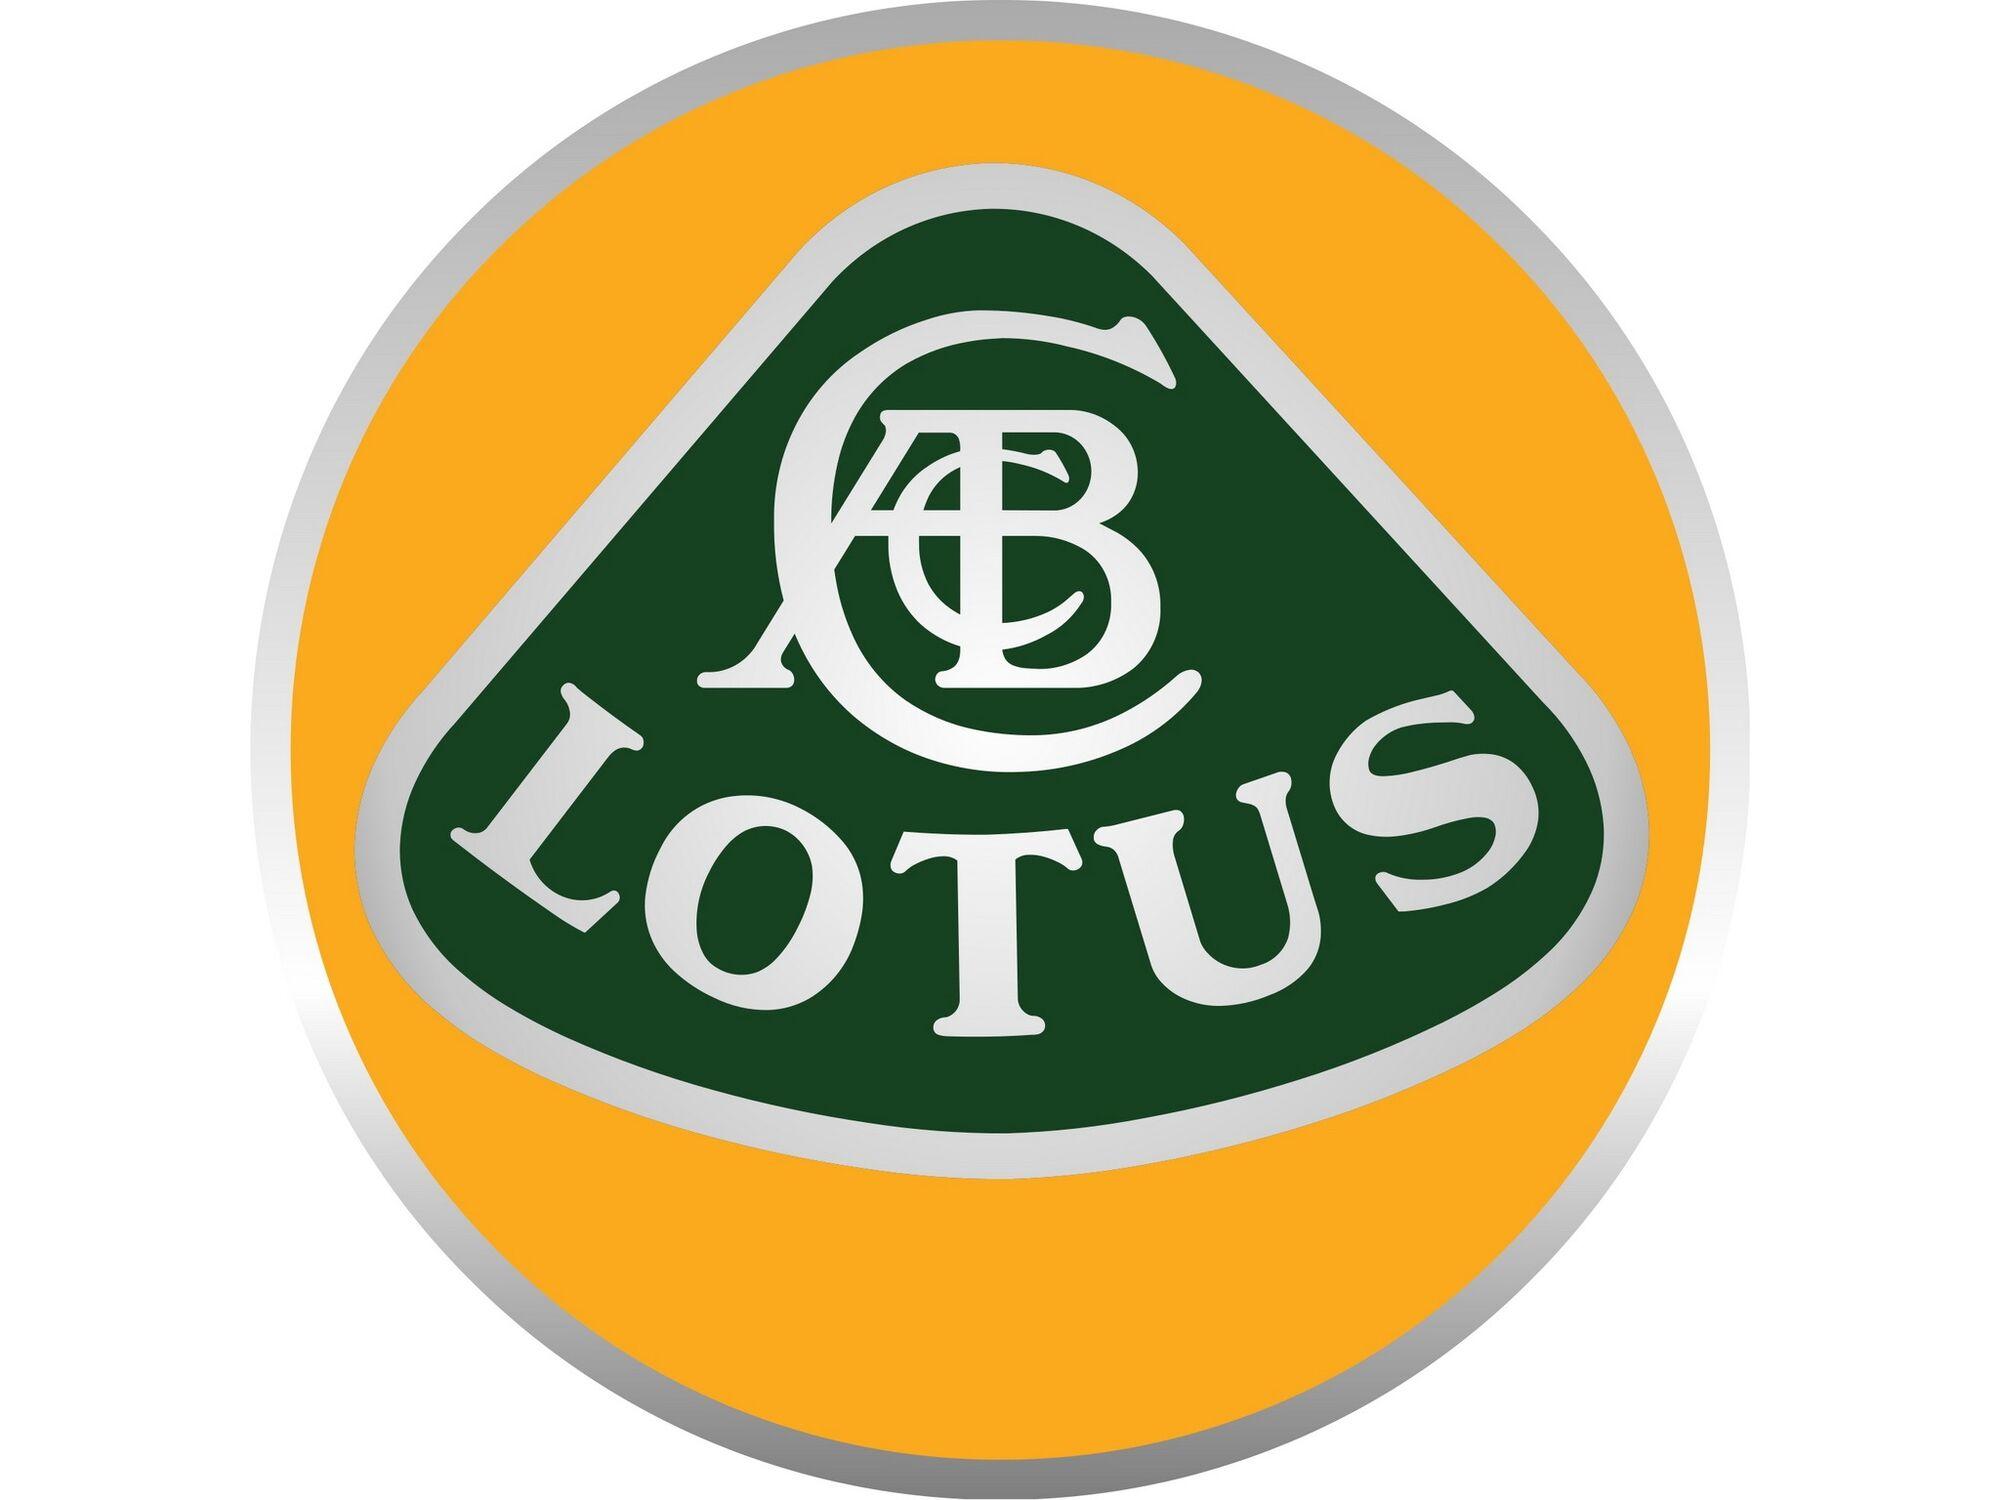 2000?cb=20150606040130 Remarkable Lotus Carlton Gran Turismo 5 Cars Trend